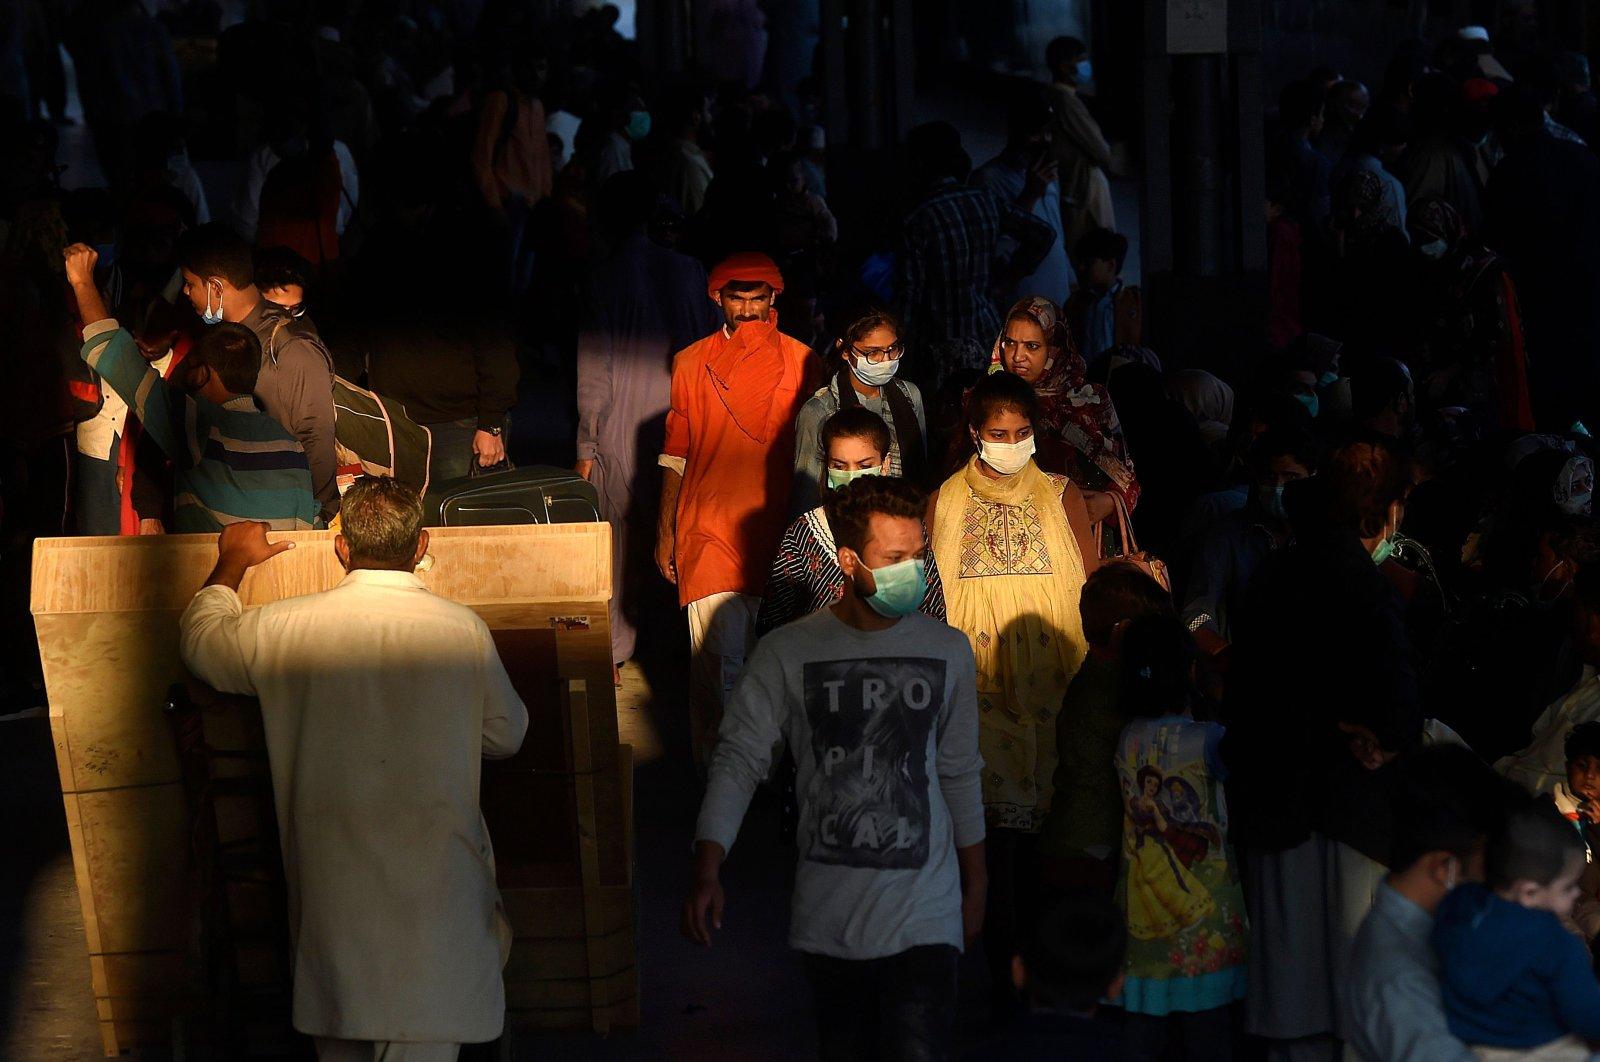 Passengers wearing masks as a preventive measure against the coronavirus spread arrive at the cantonment railway station, Karachi, Pakistan, Dec. 1, 2020. (AFP Photo)